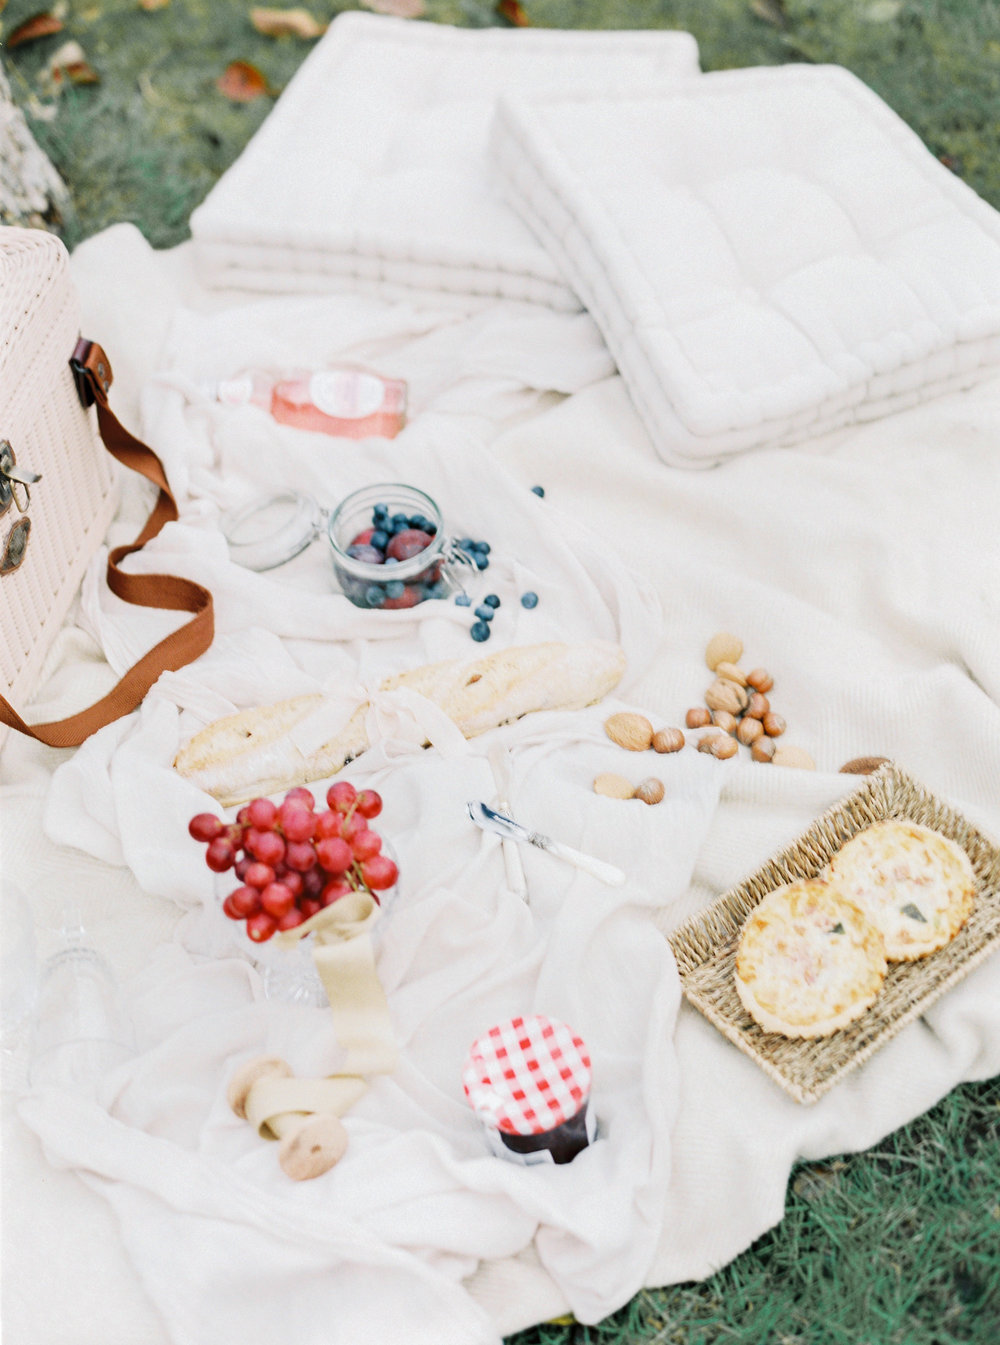 Luxury Wedding Planner UK | Our Chic & Romantic Engagement Shoot in Bath | Katie Julia Photography - 2.JPG